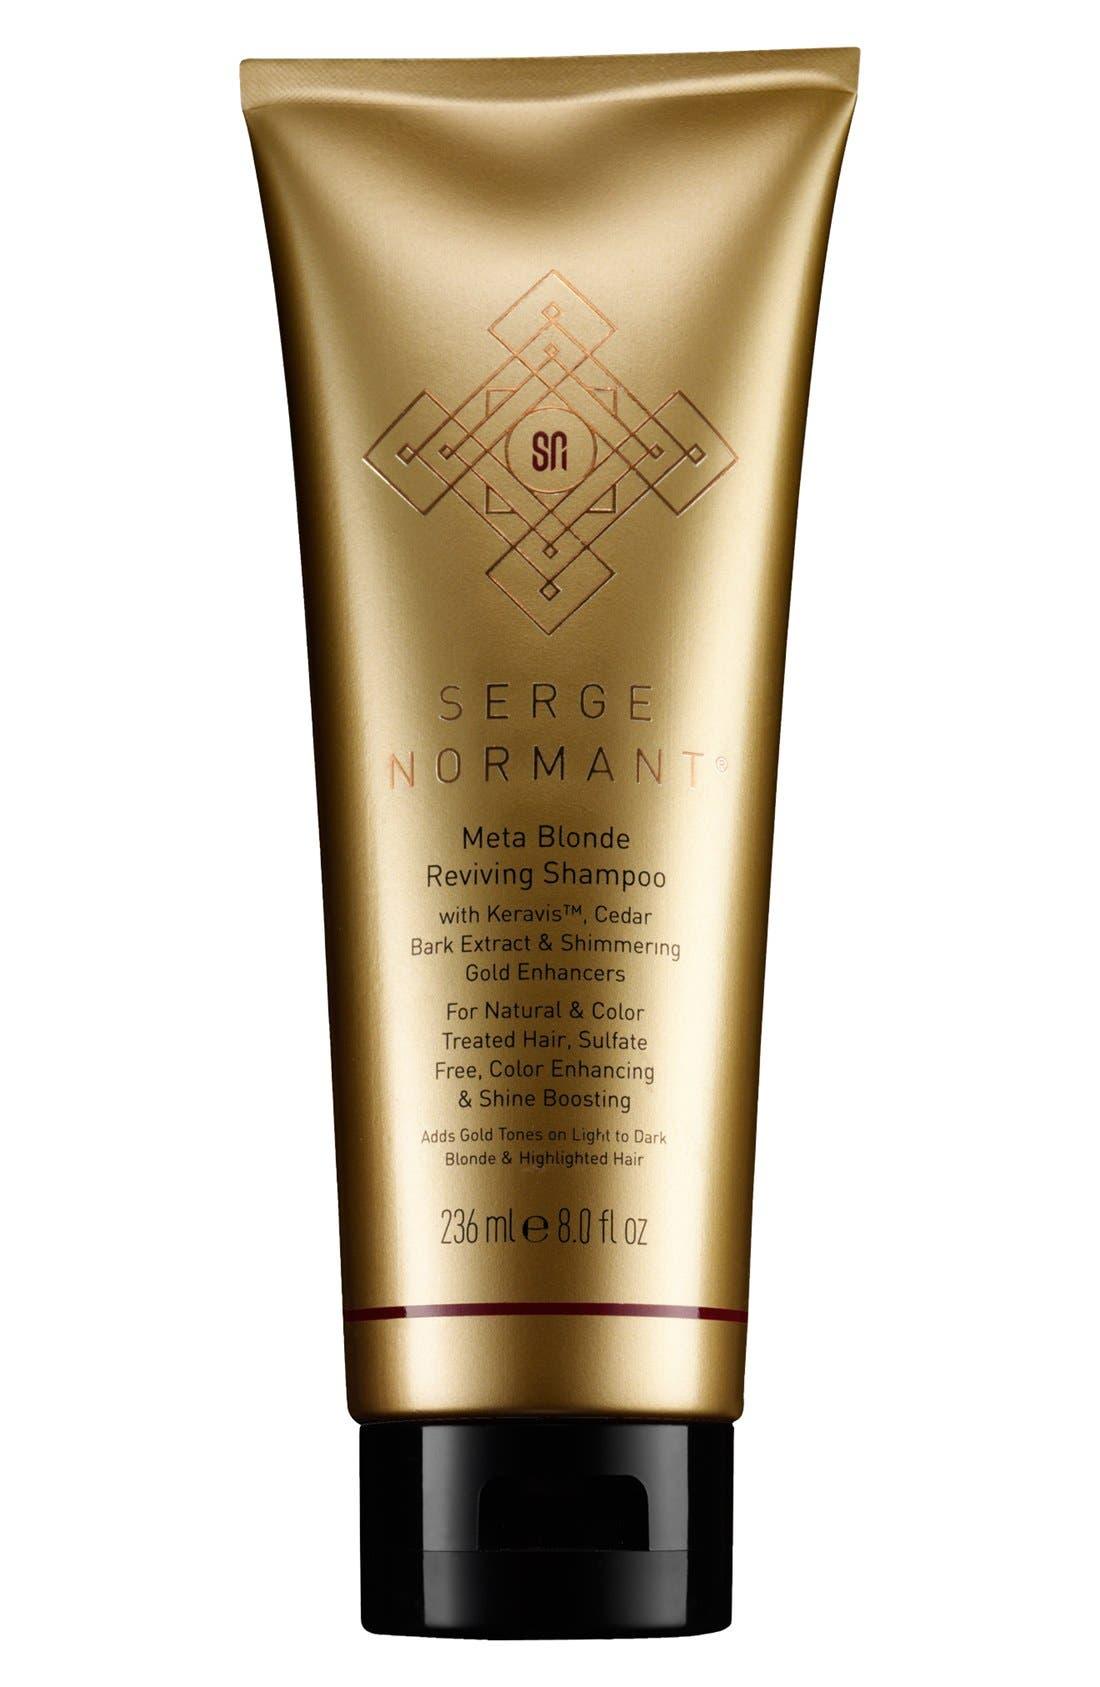 Serge Normant 'Meta Blonde' Reviving Shampoo